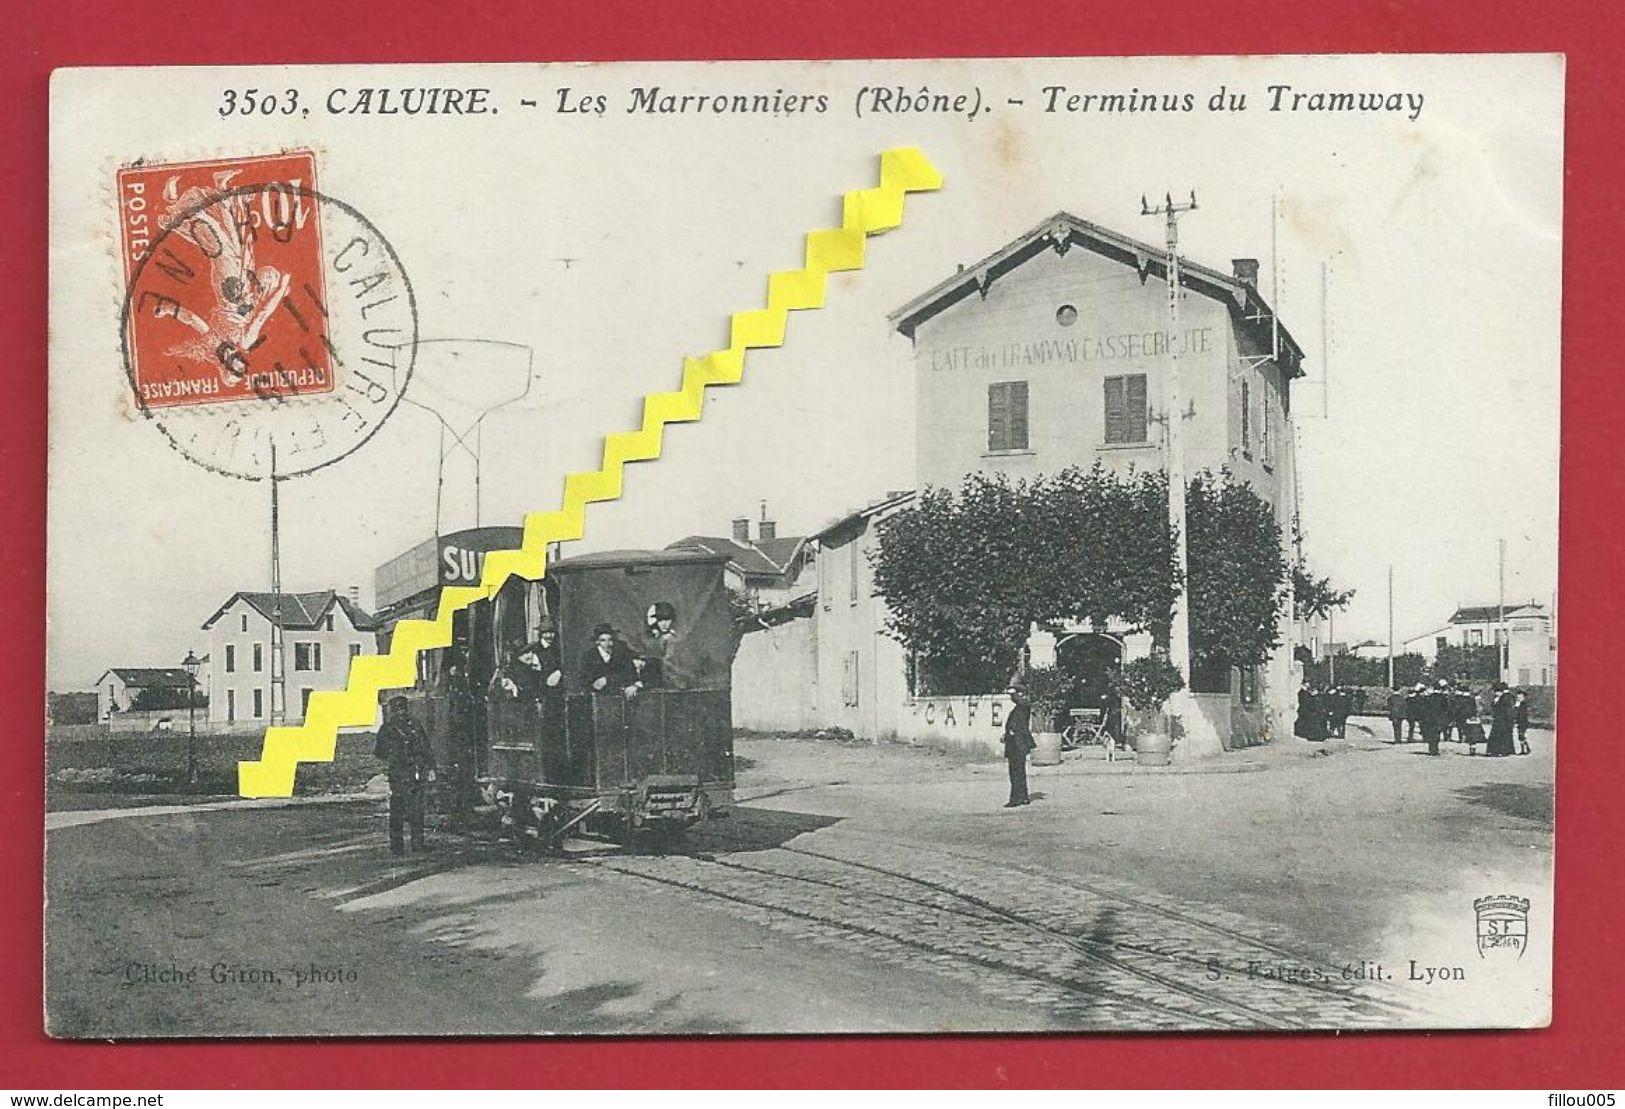 69 CALUIRE.. LES MARRONNIERS  (RHÔNE )  ANIMEE.. TERMINUS DU TRAMWAY... CAFE..PUBLICITE SUNLIGHT.......C2331 - Tramways